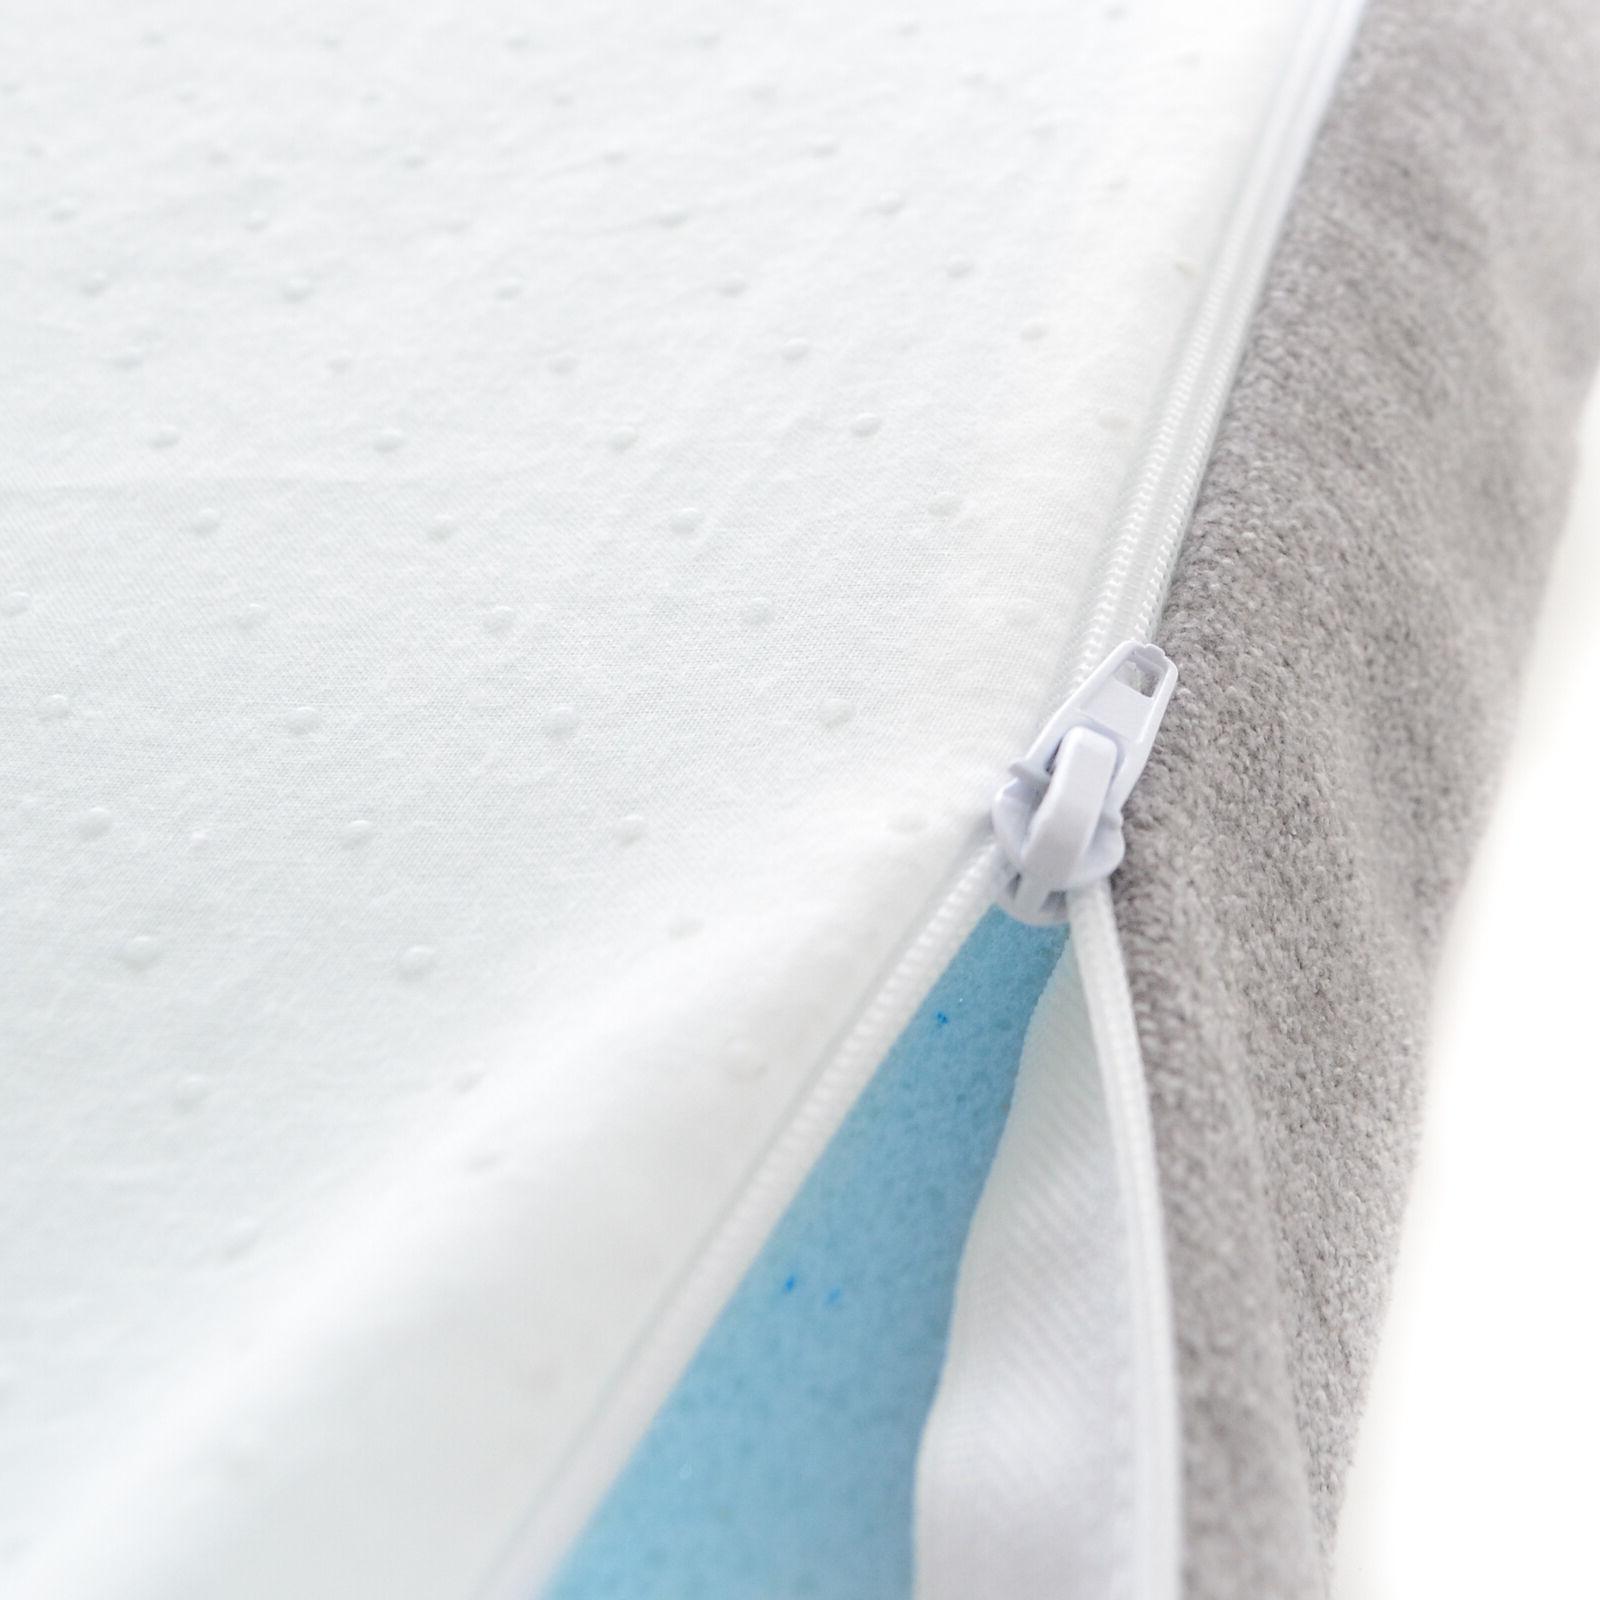 Milliard Memory Foam Topper Washable Removable